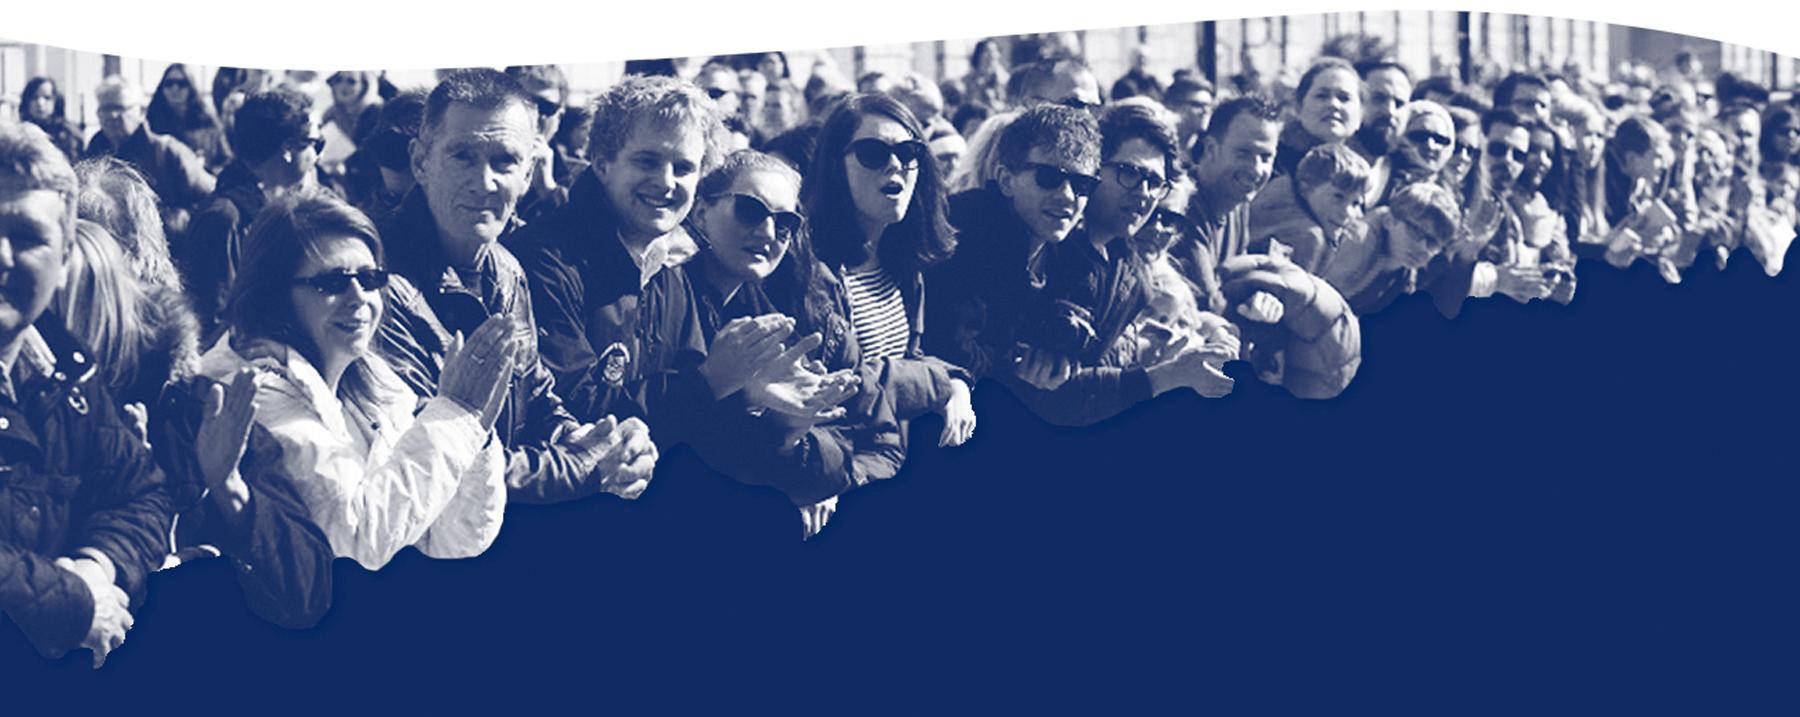 Horizontal image of crowd